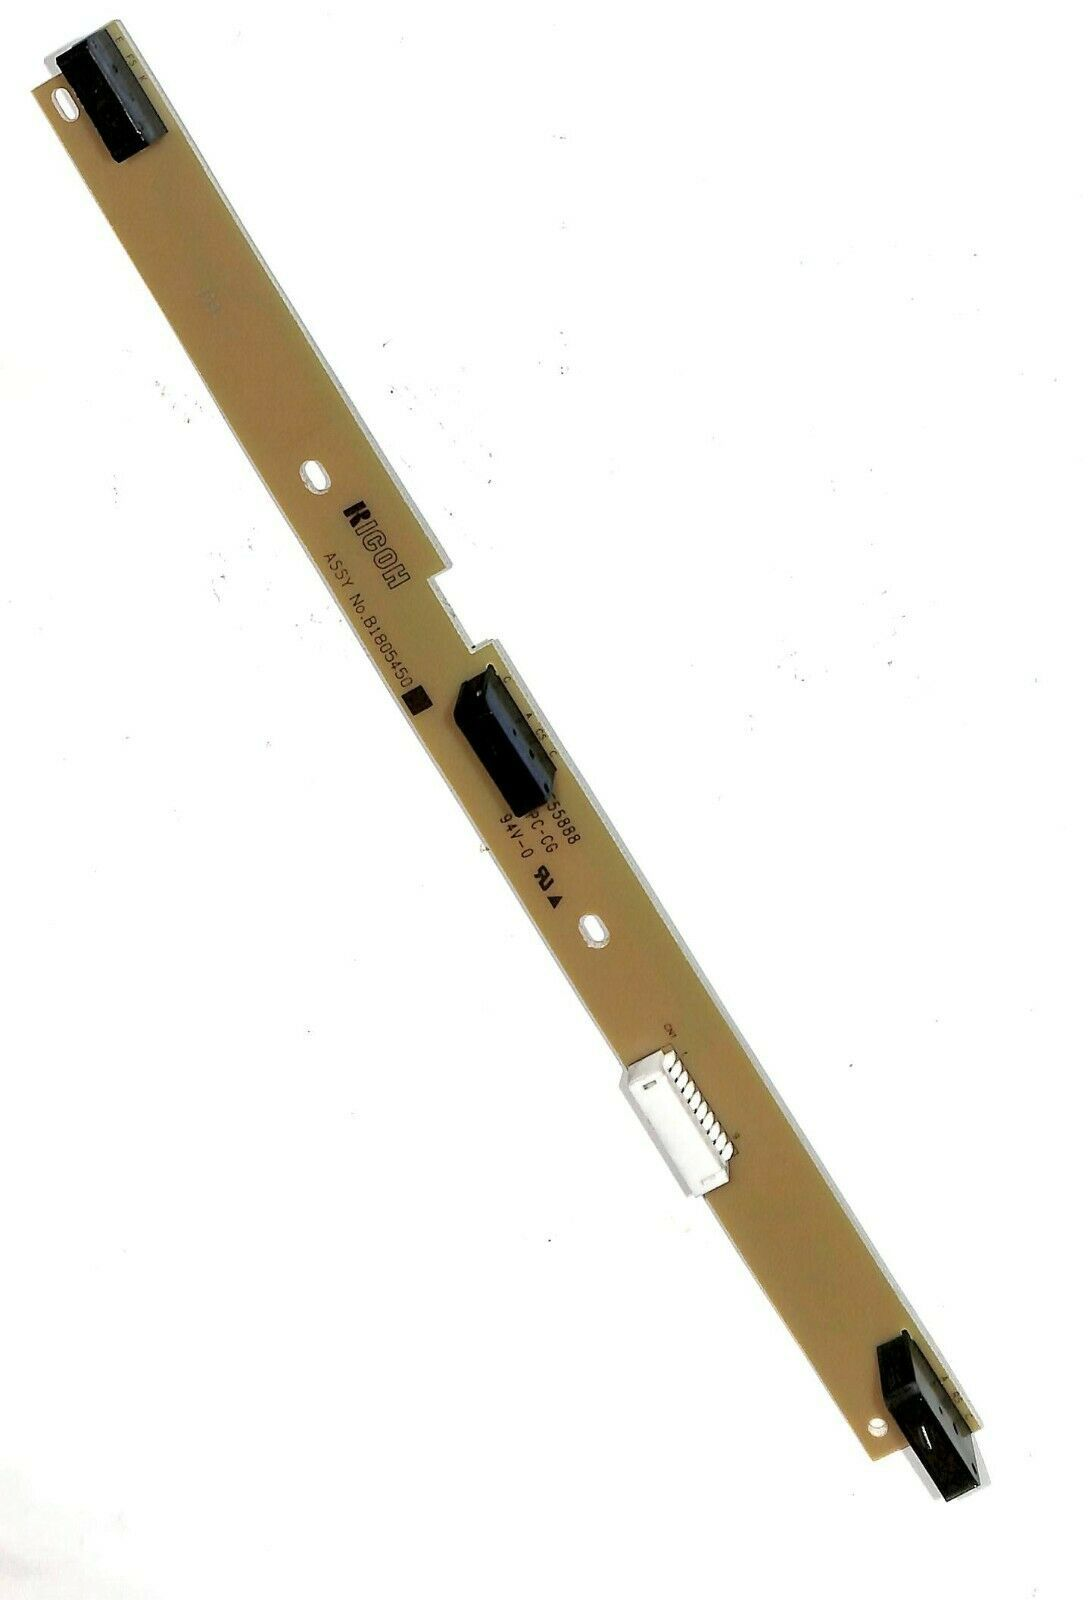 Ricoh B180-5450 ID Sensor in Paper Exit Unit for Aficio 2232C CL7200 CL7300 - $14.84